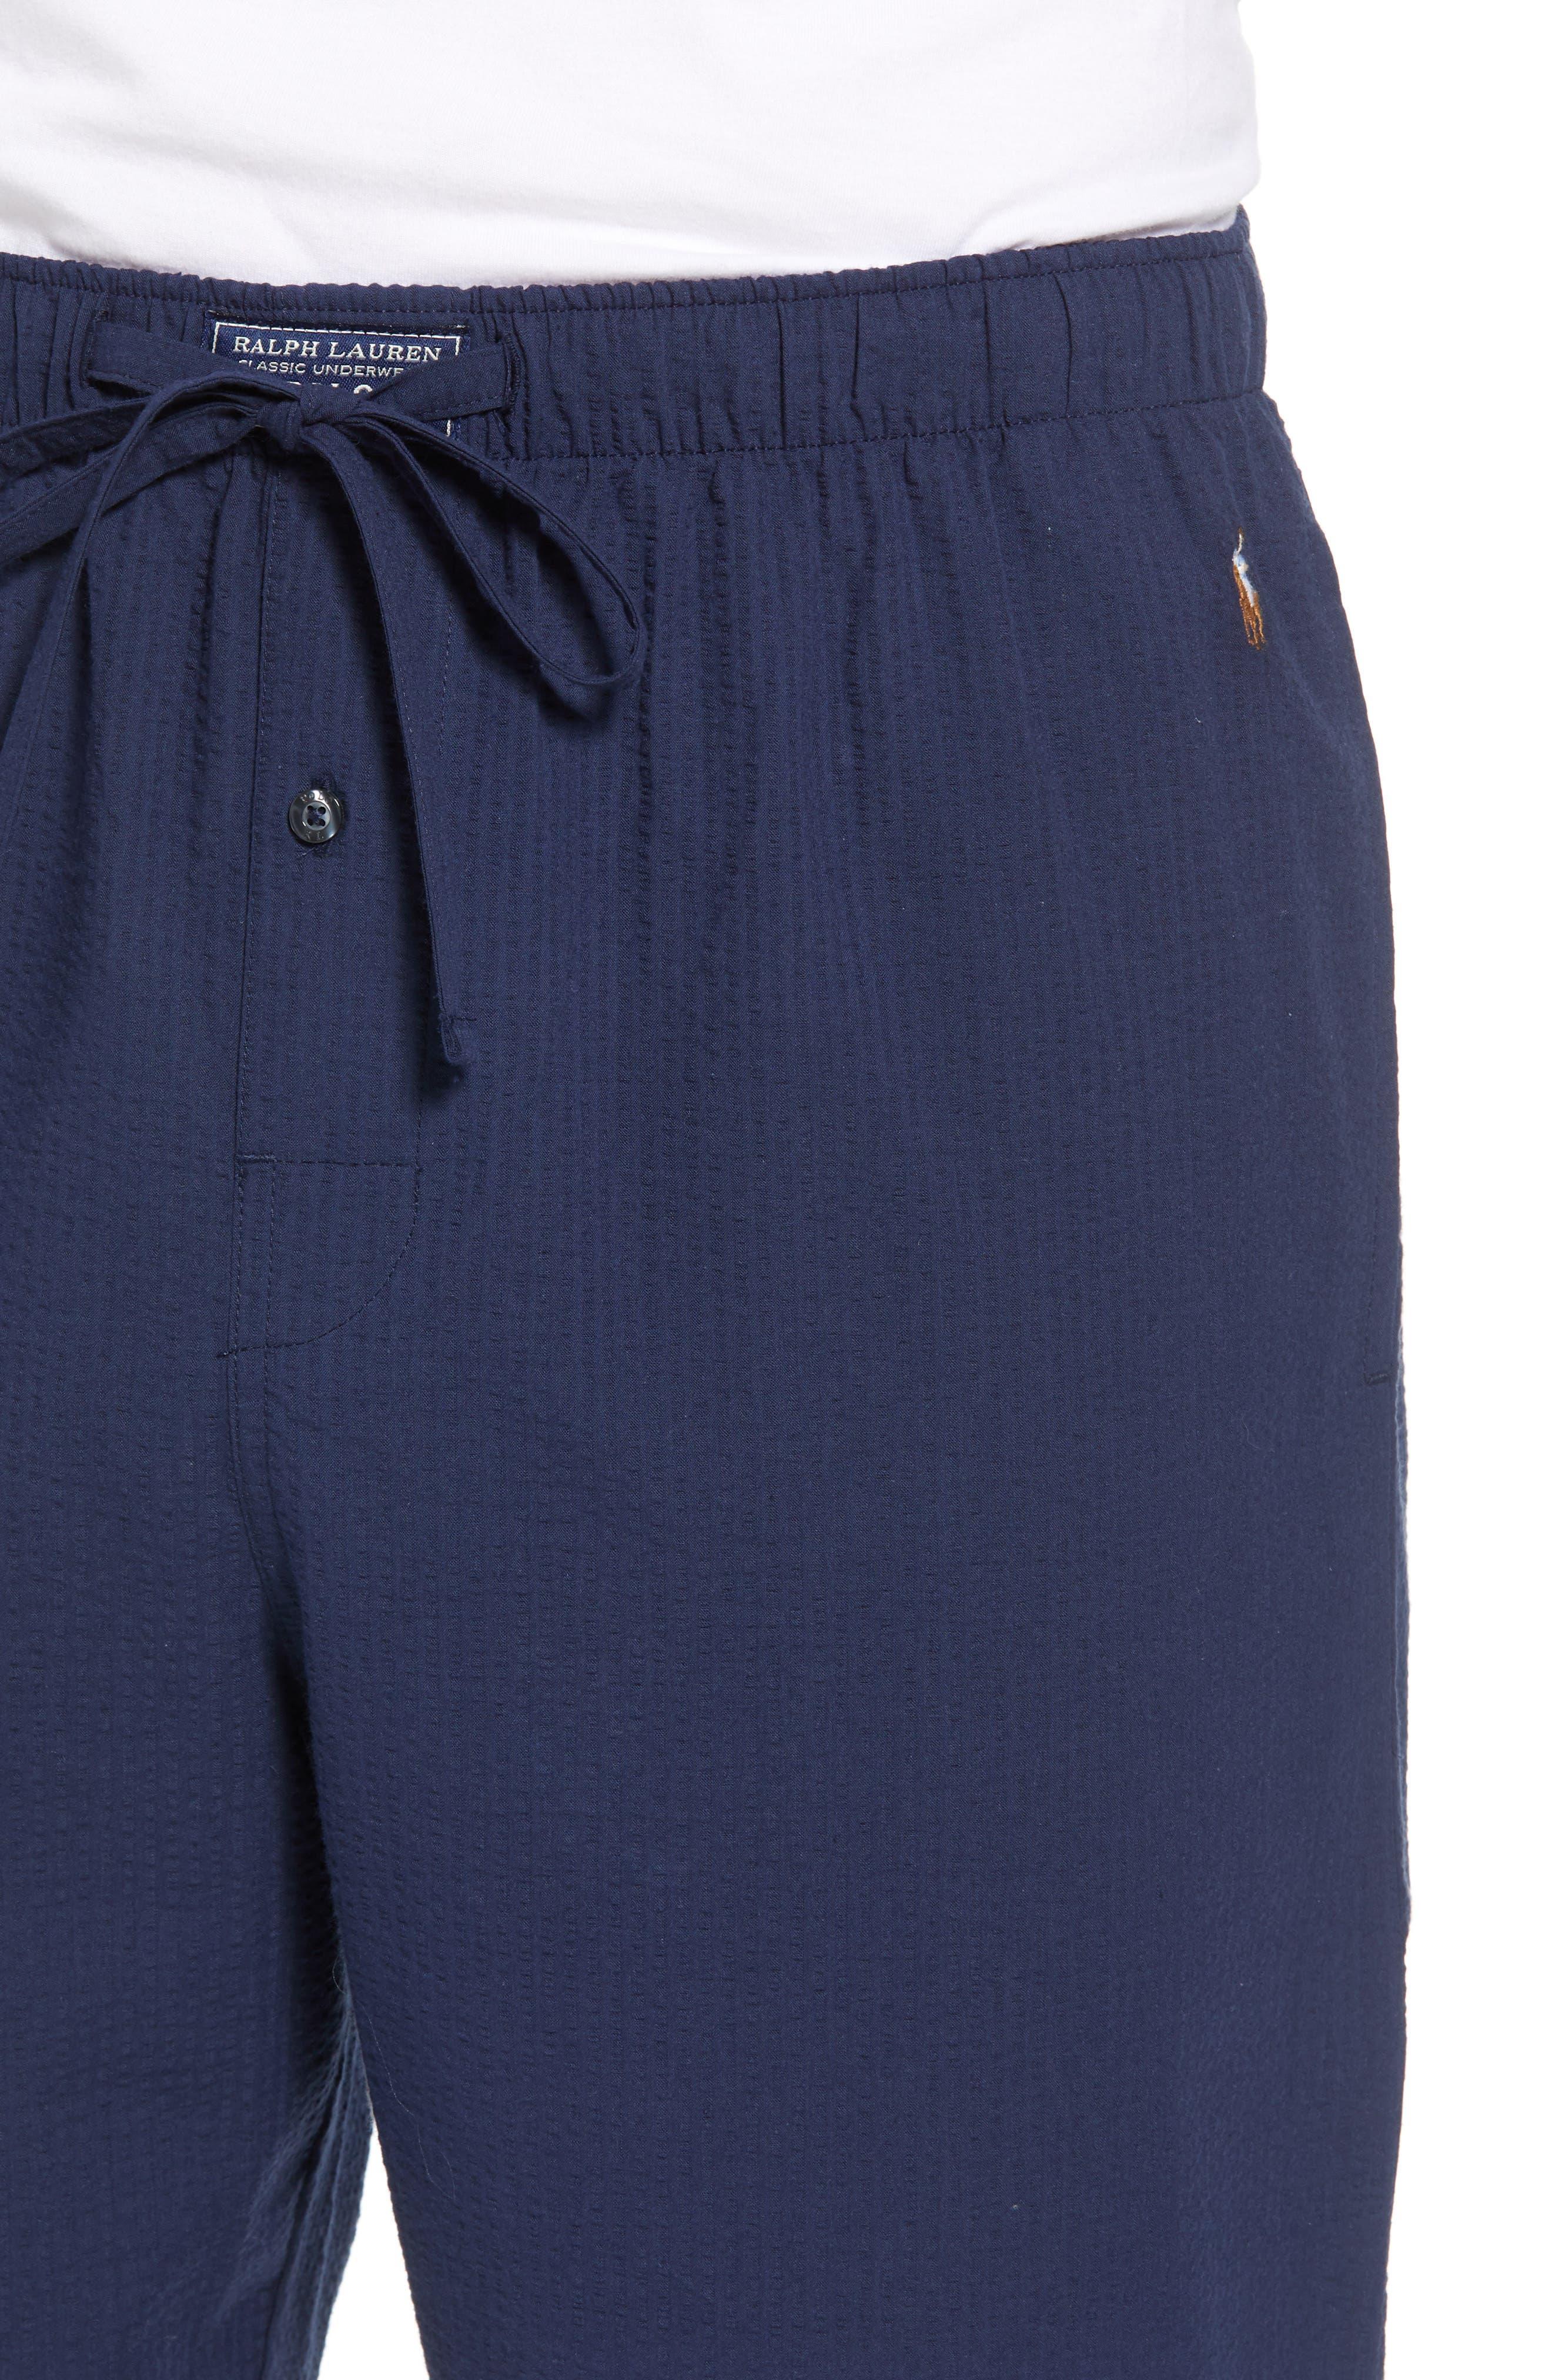 Seersucker Pajama Pants,                             Alternate thumbnail 4, color,                             NAVY SEERSUCKER